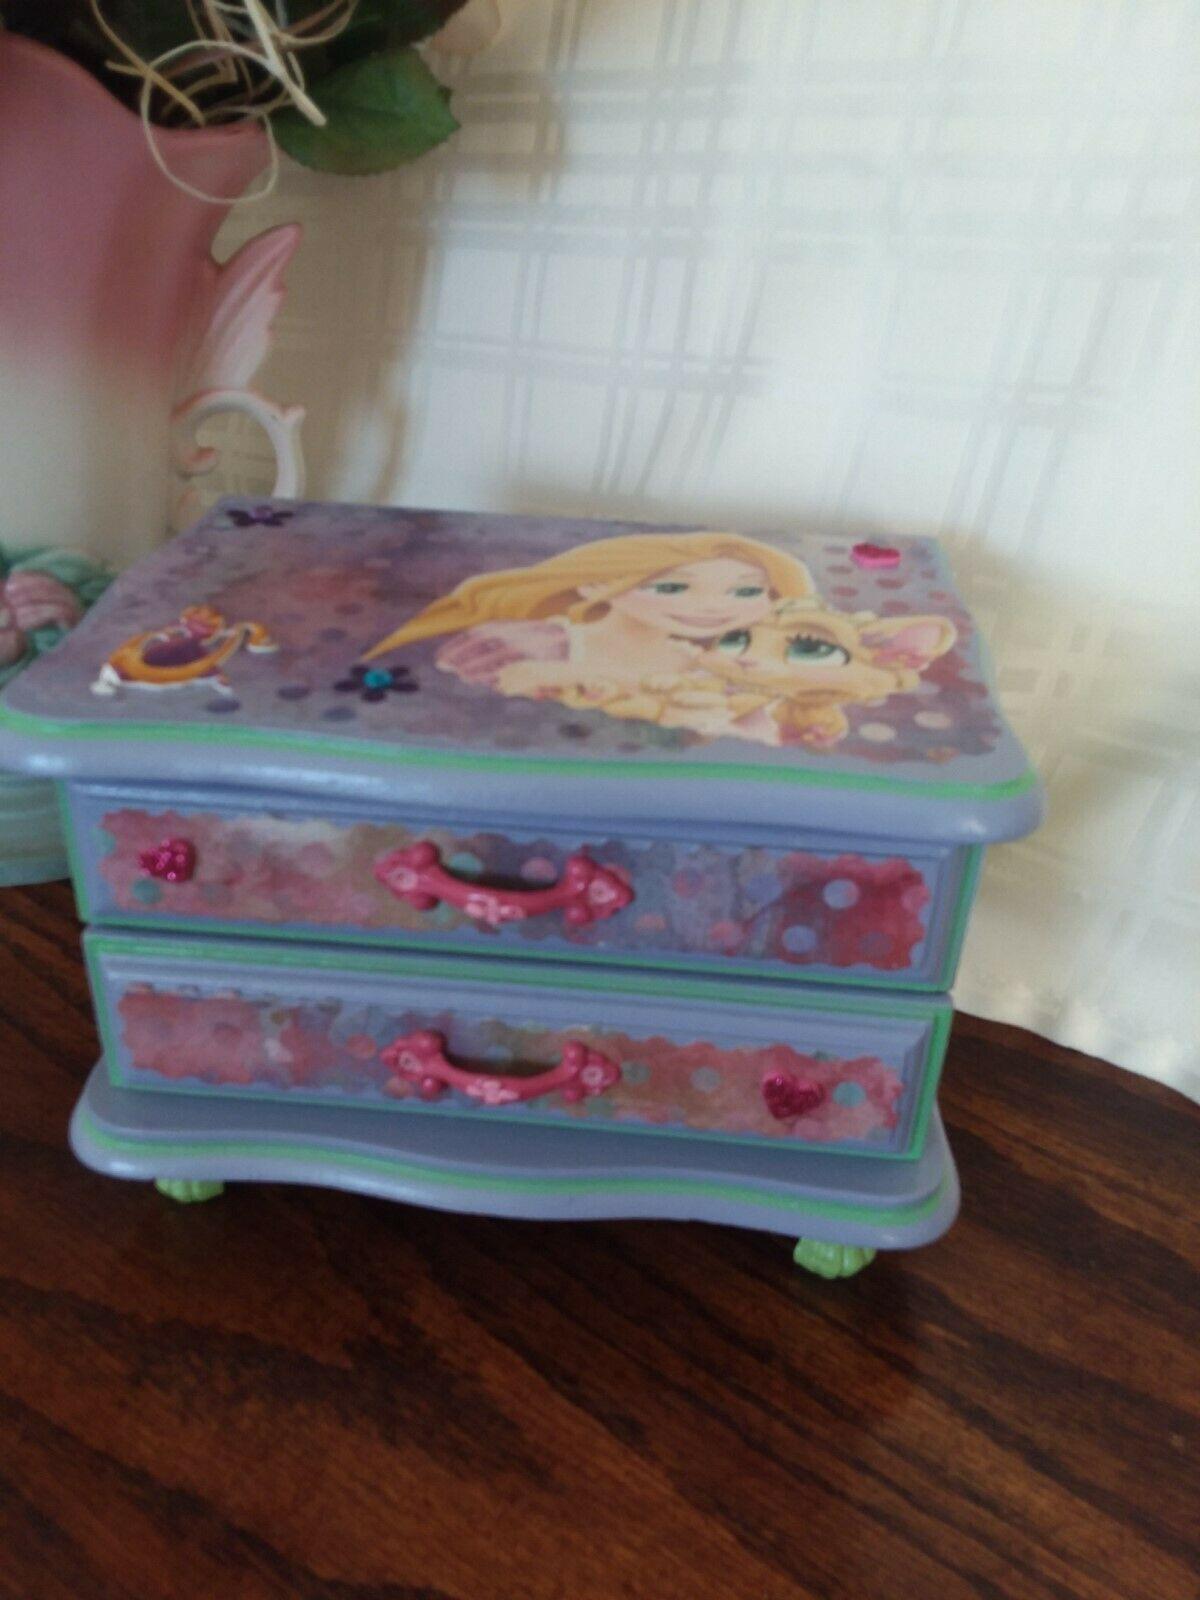 Refurbished Tangled Wood Jewelry Box Wood jewelry box